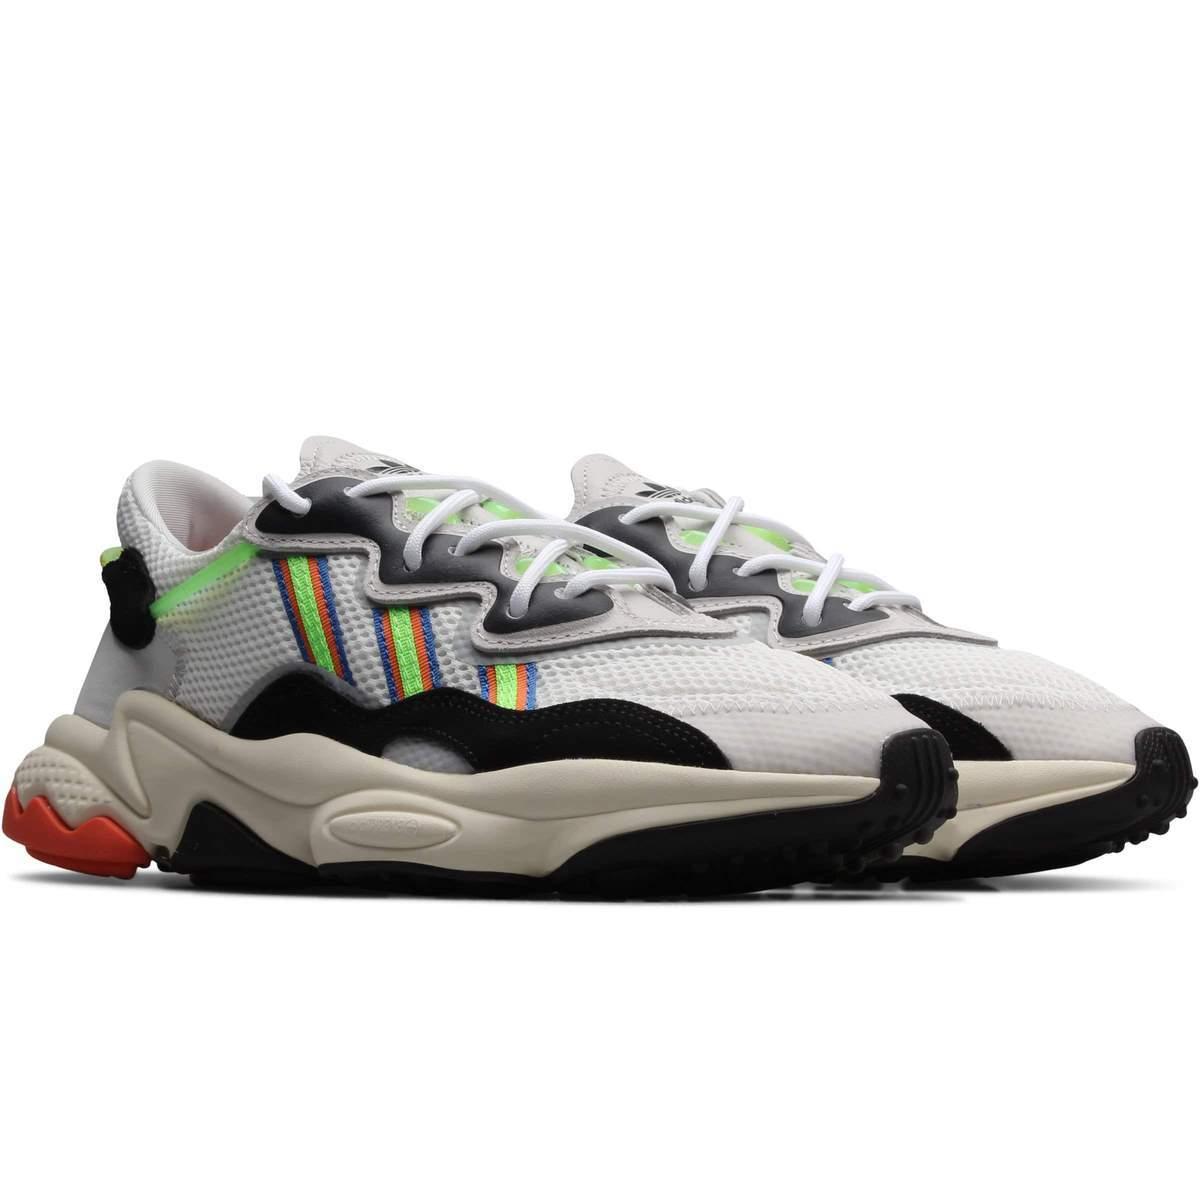 Adidas Originals Ozweego White/Solar Green